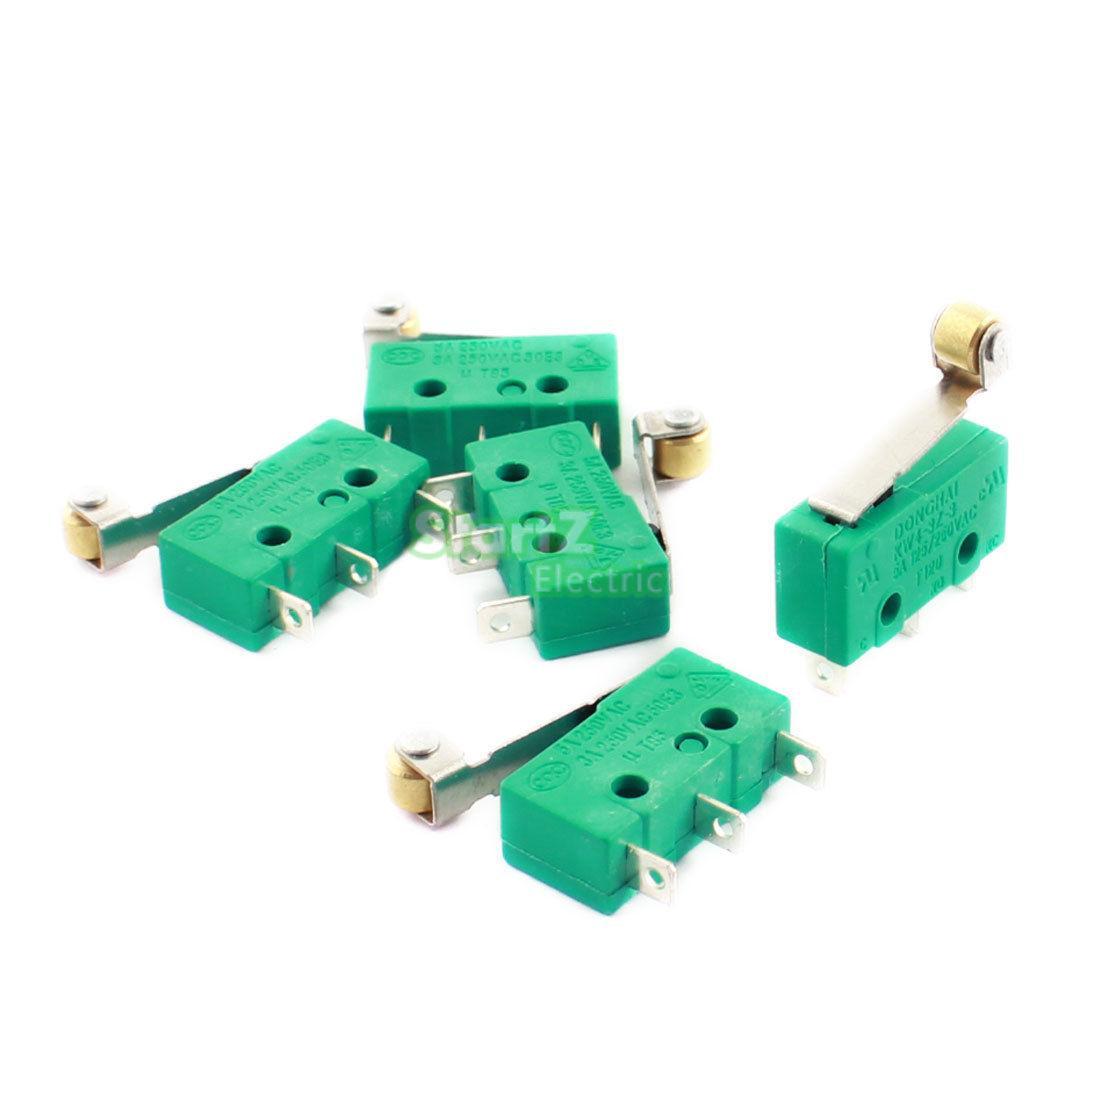 10PCS microswitch limit switch 3pin N/O N/C pulley microswitch KW4-3Z